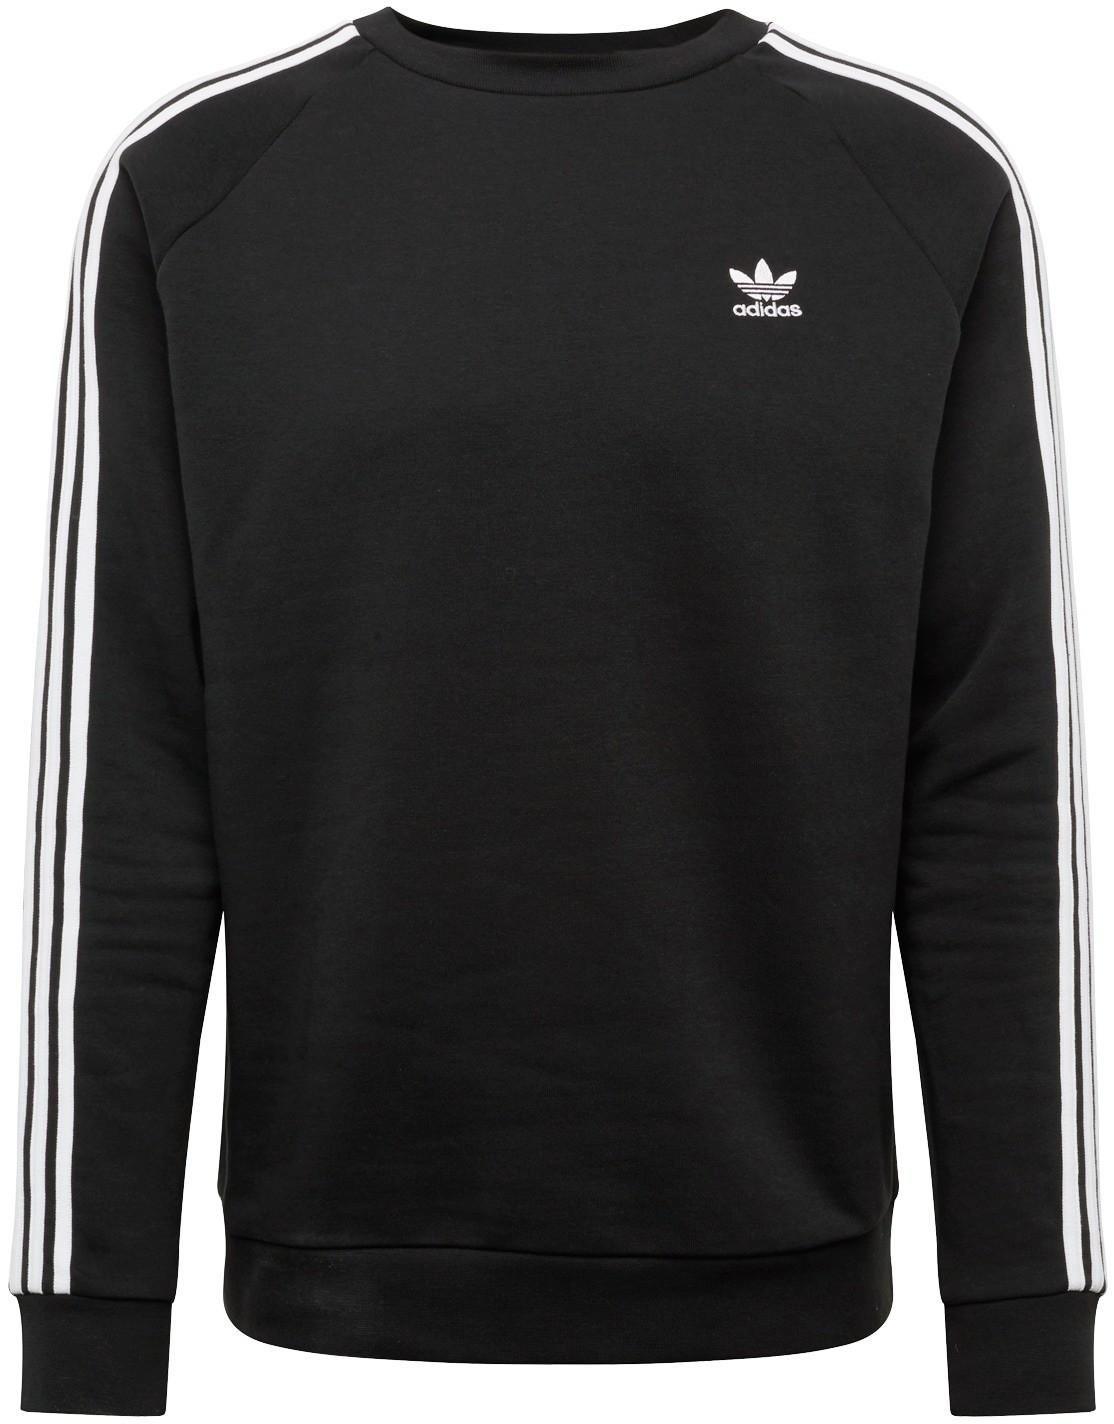 adidas Originals sweater pulli longsleeve langarm Gr.LXL